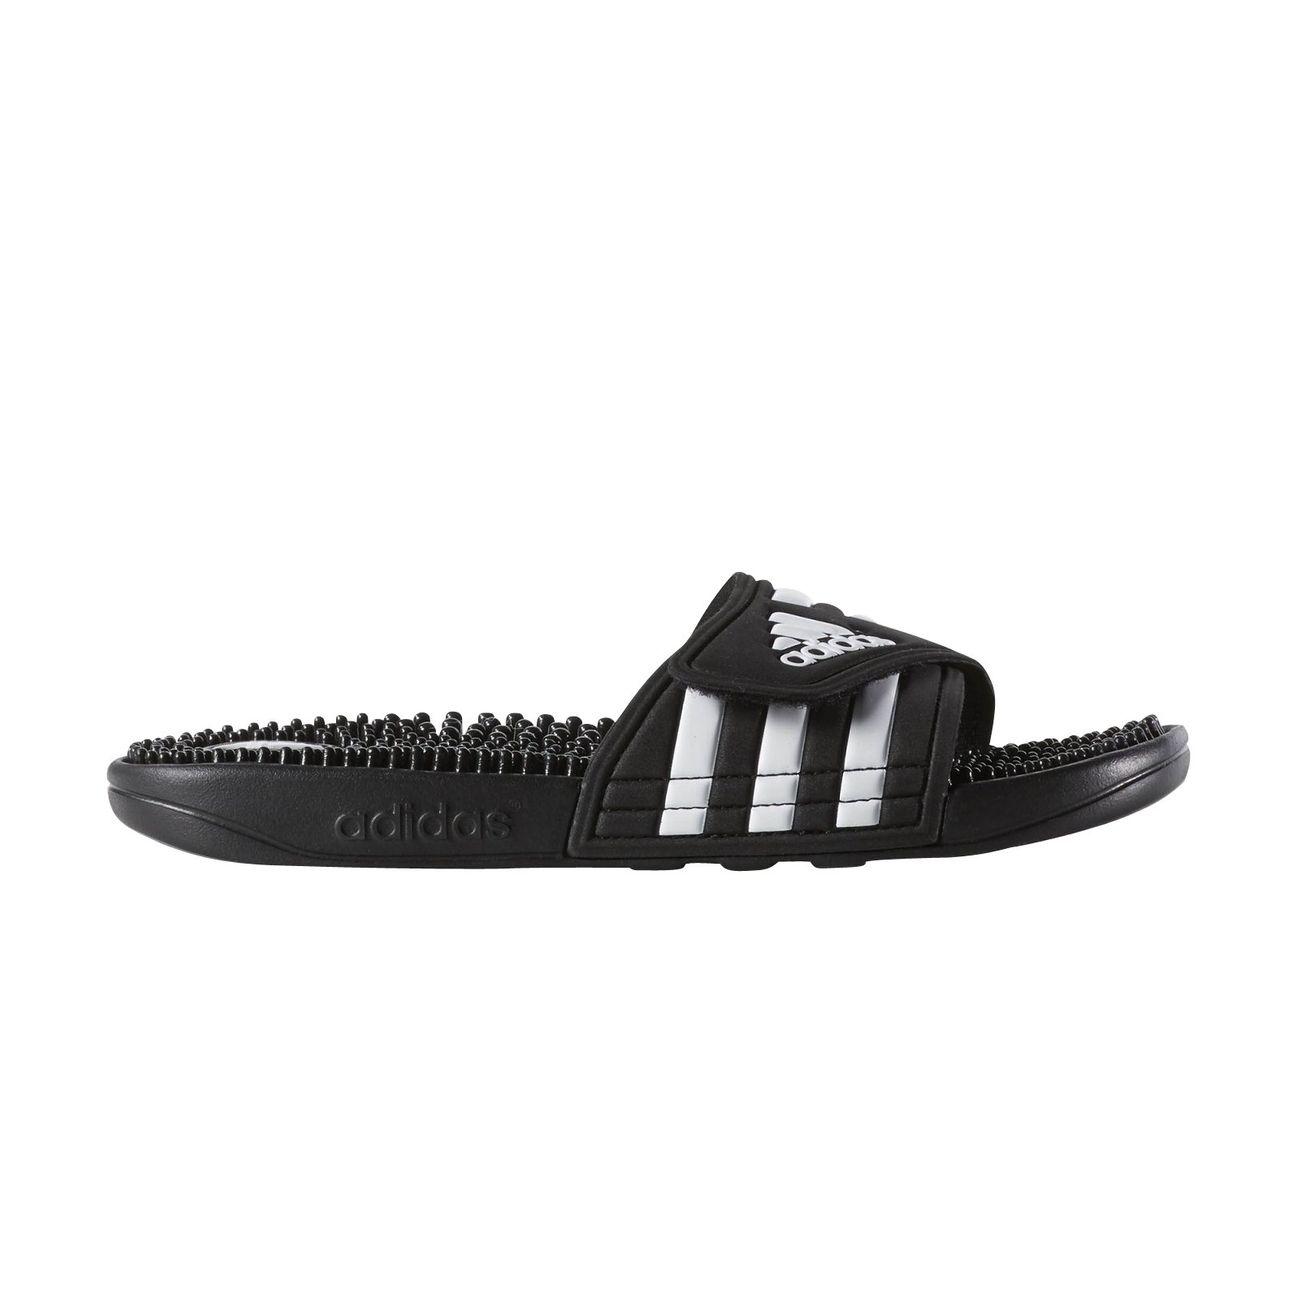 Adissage W - Chaussures - Sandales Adidas yhEou